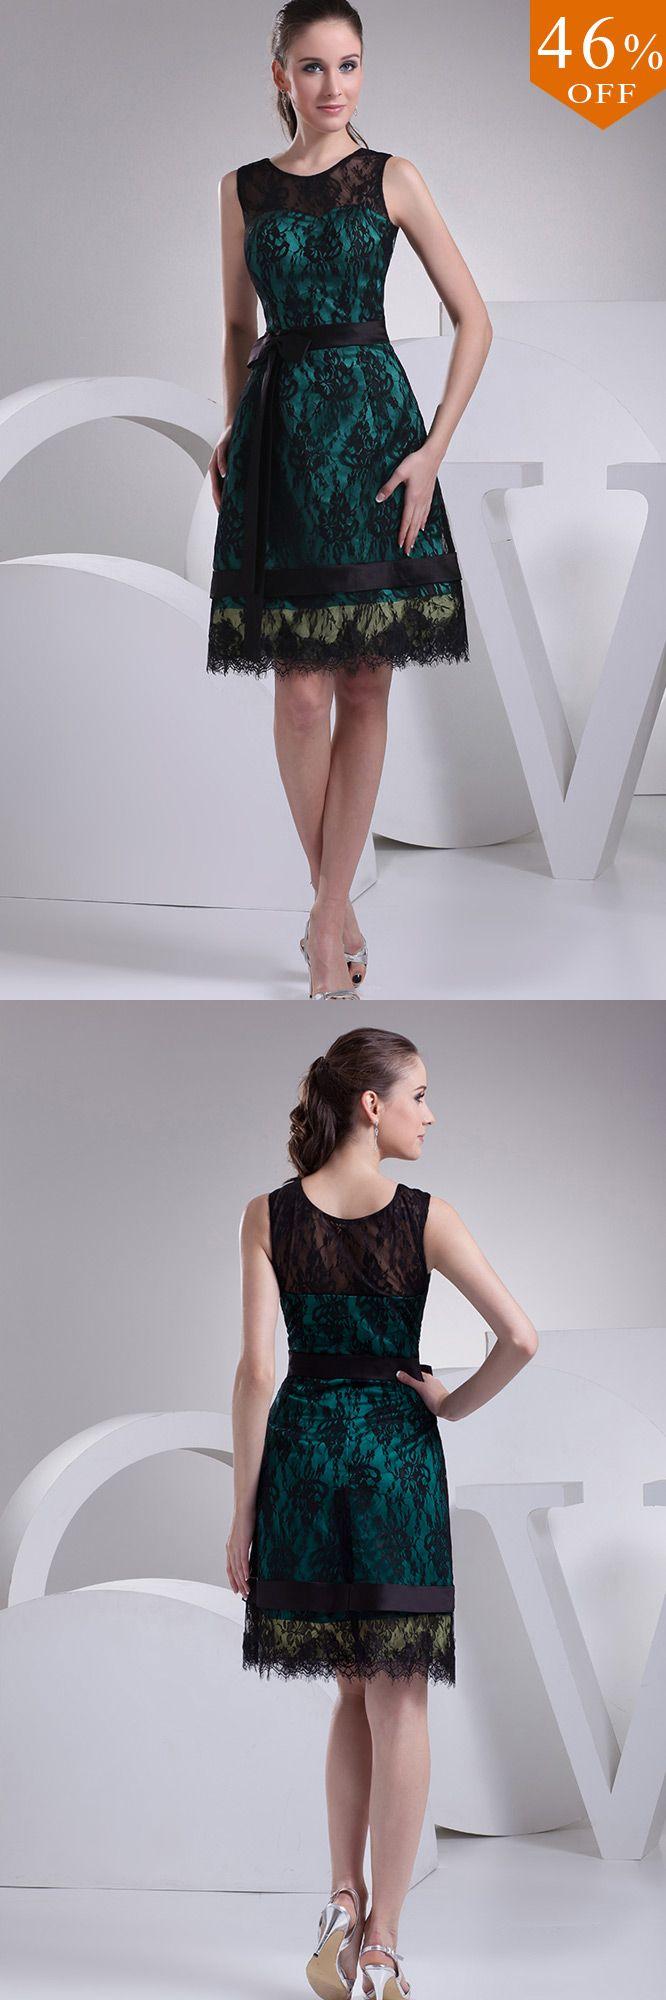 Black lace high neckline short dress special occasion op